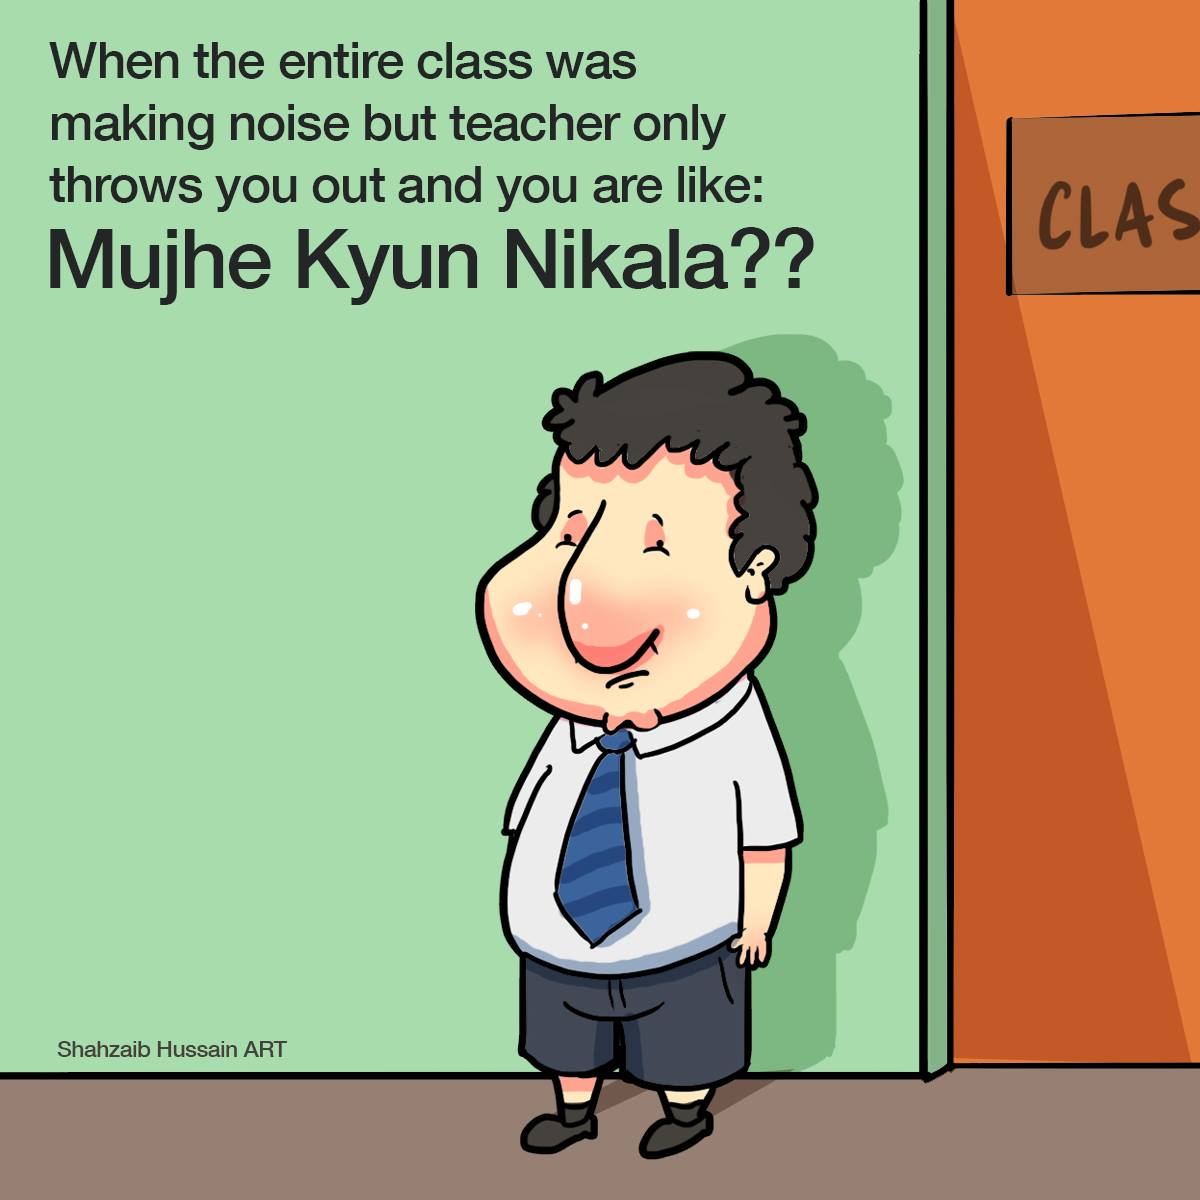 Mujhe Kyun Nikala